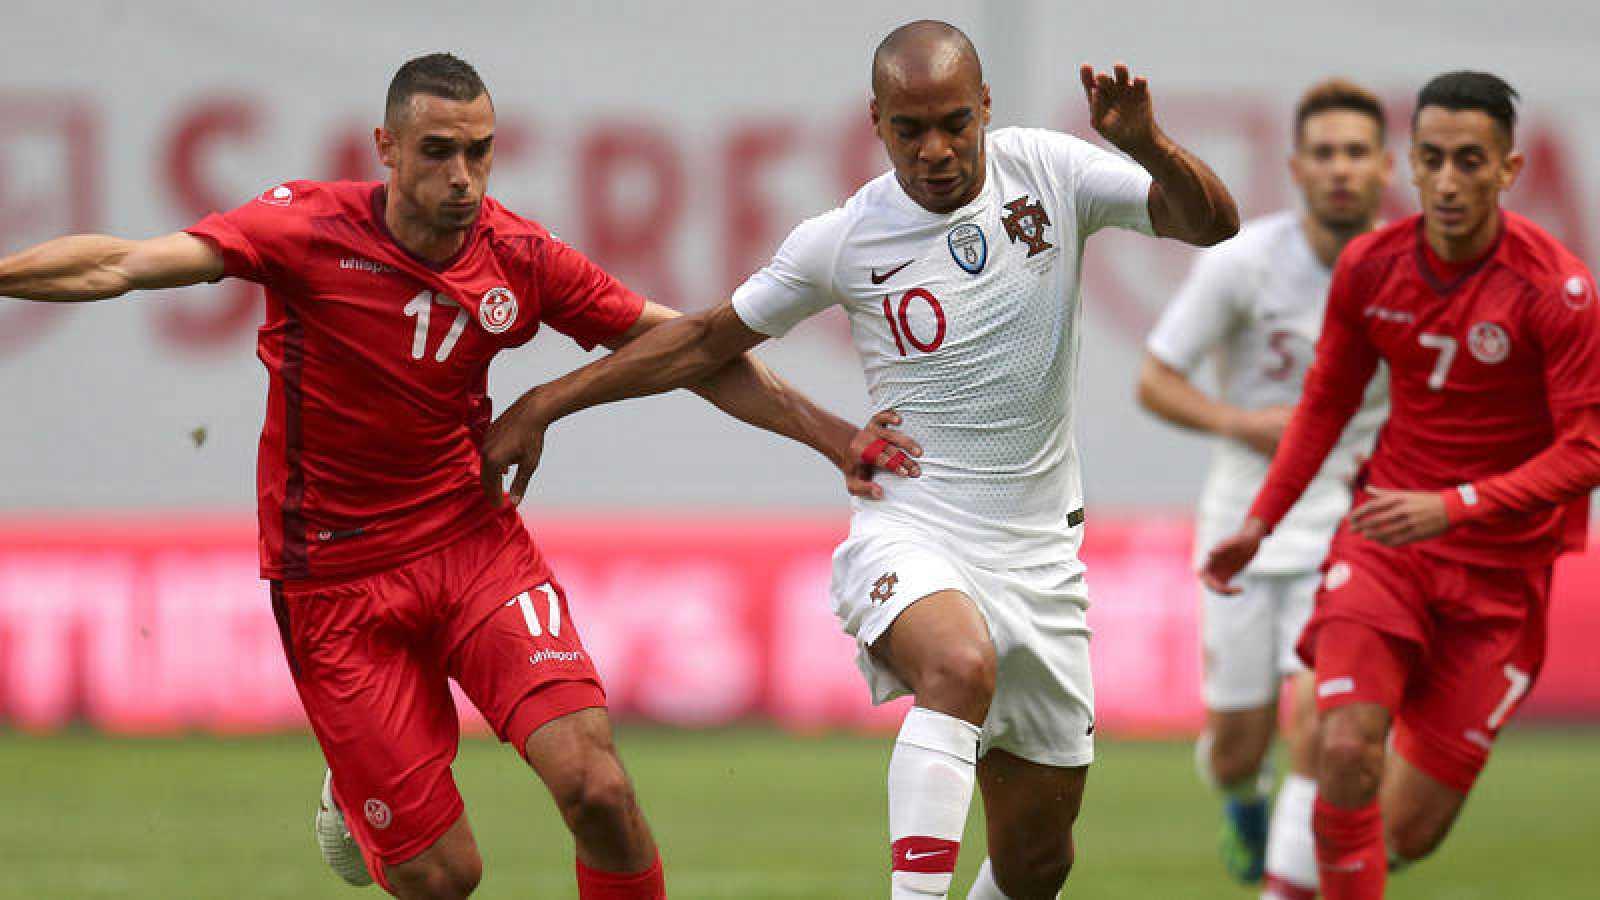 Imagen del Portugal - Túnez, amistoso preparatorio del Mundial.